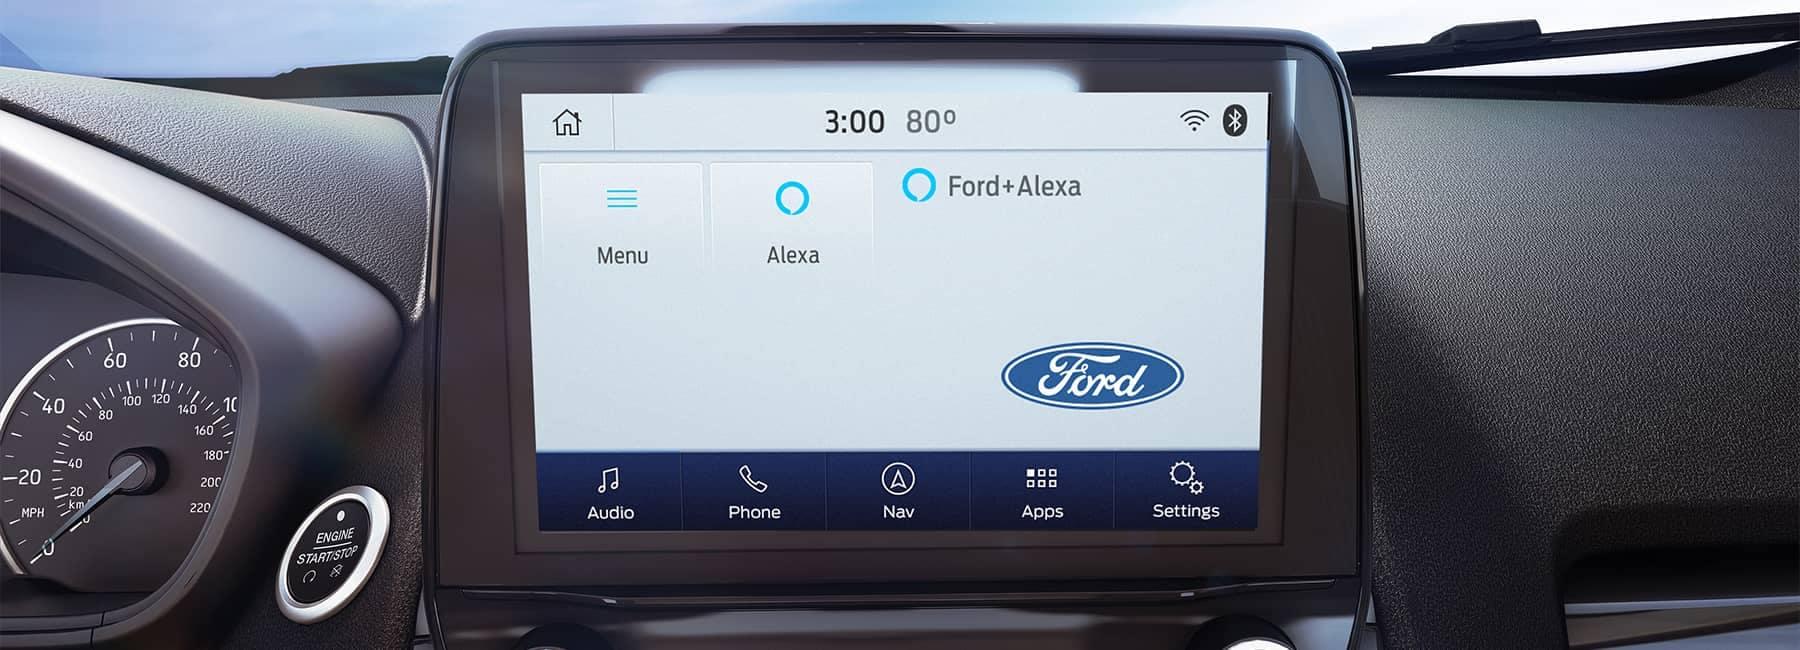 2021 Ford EcoSport Dashboard Console